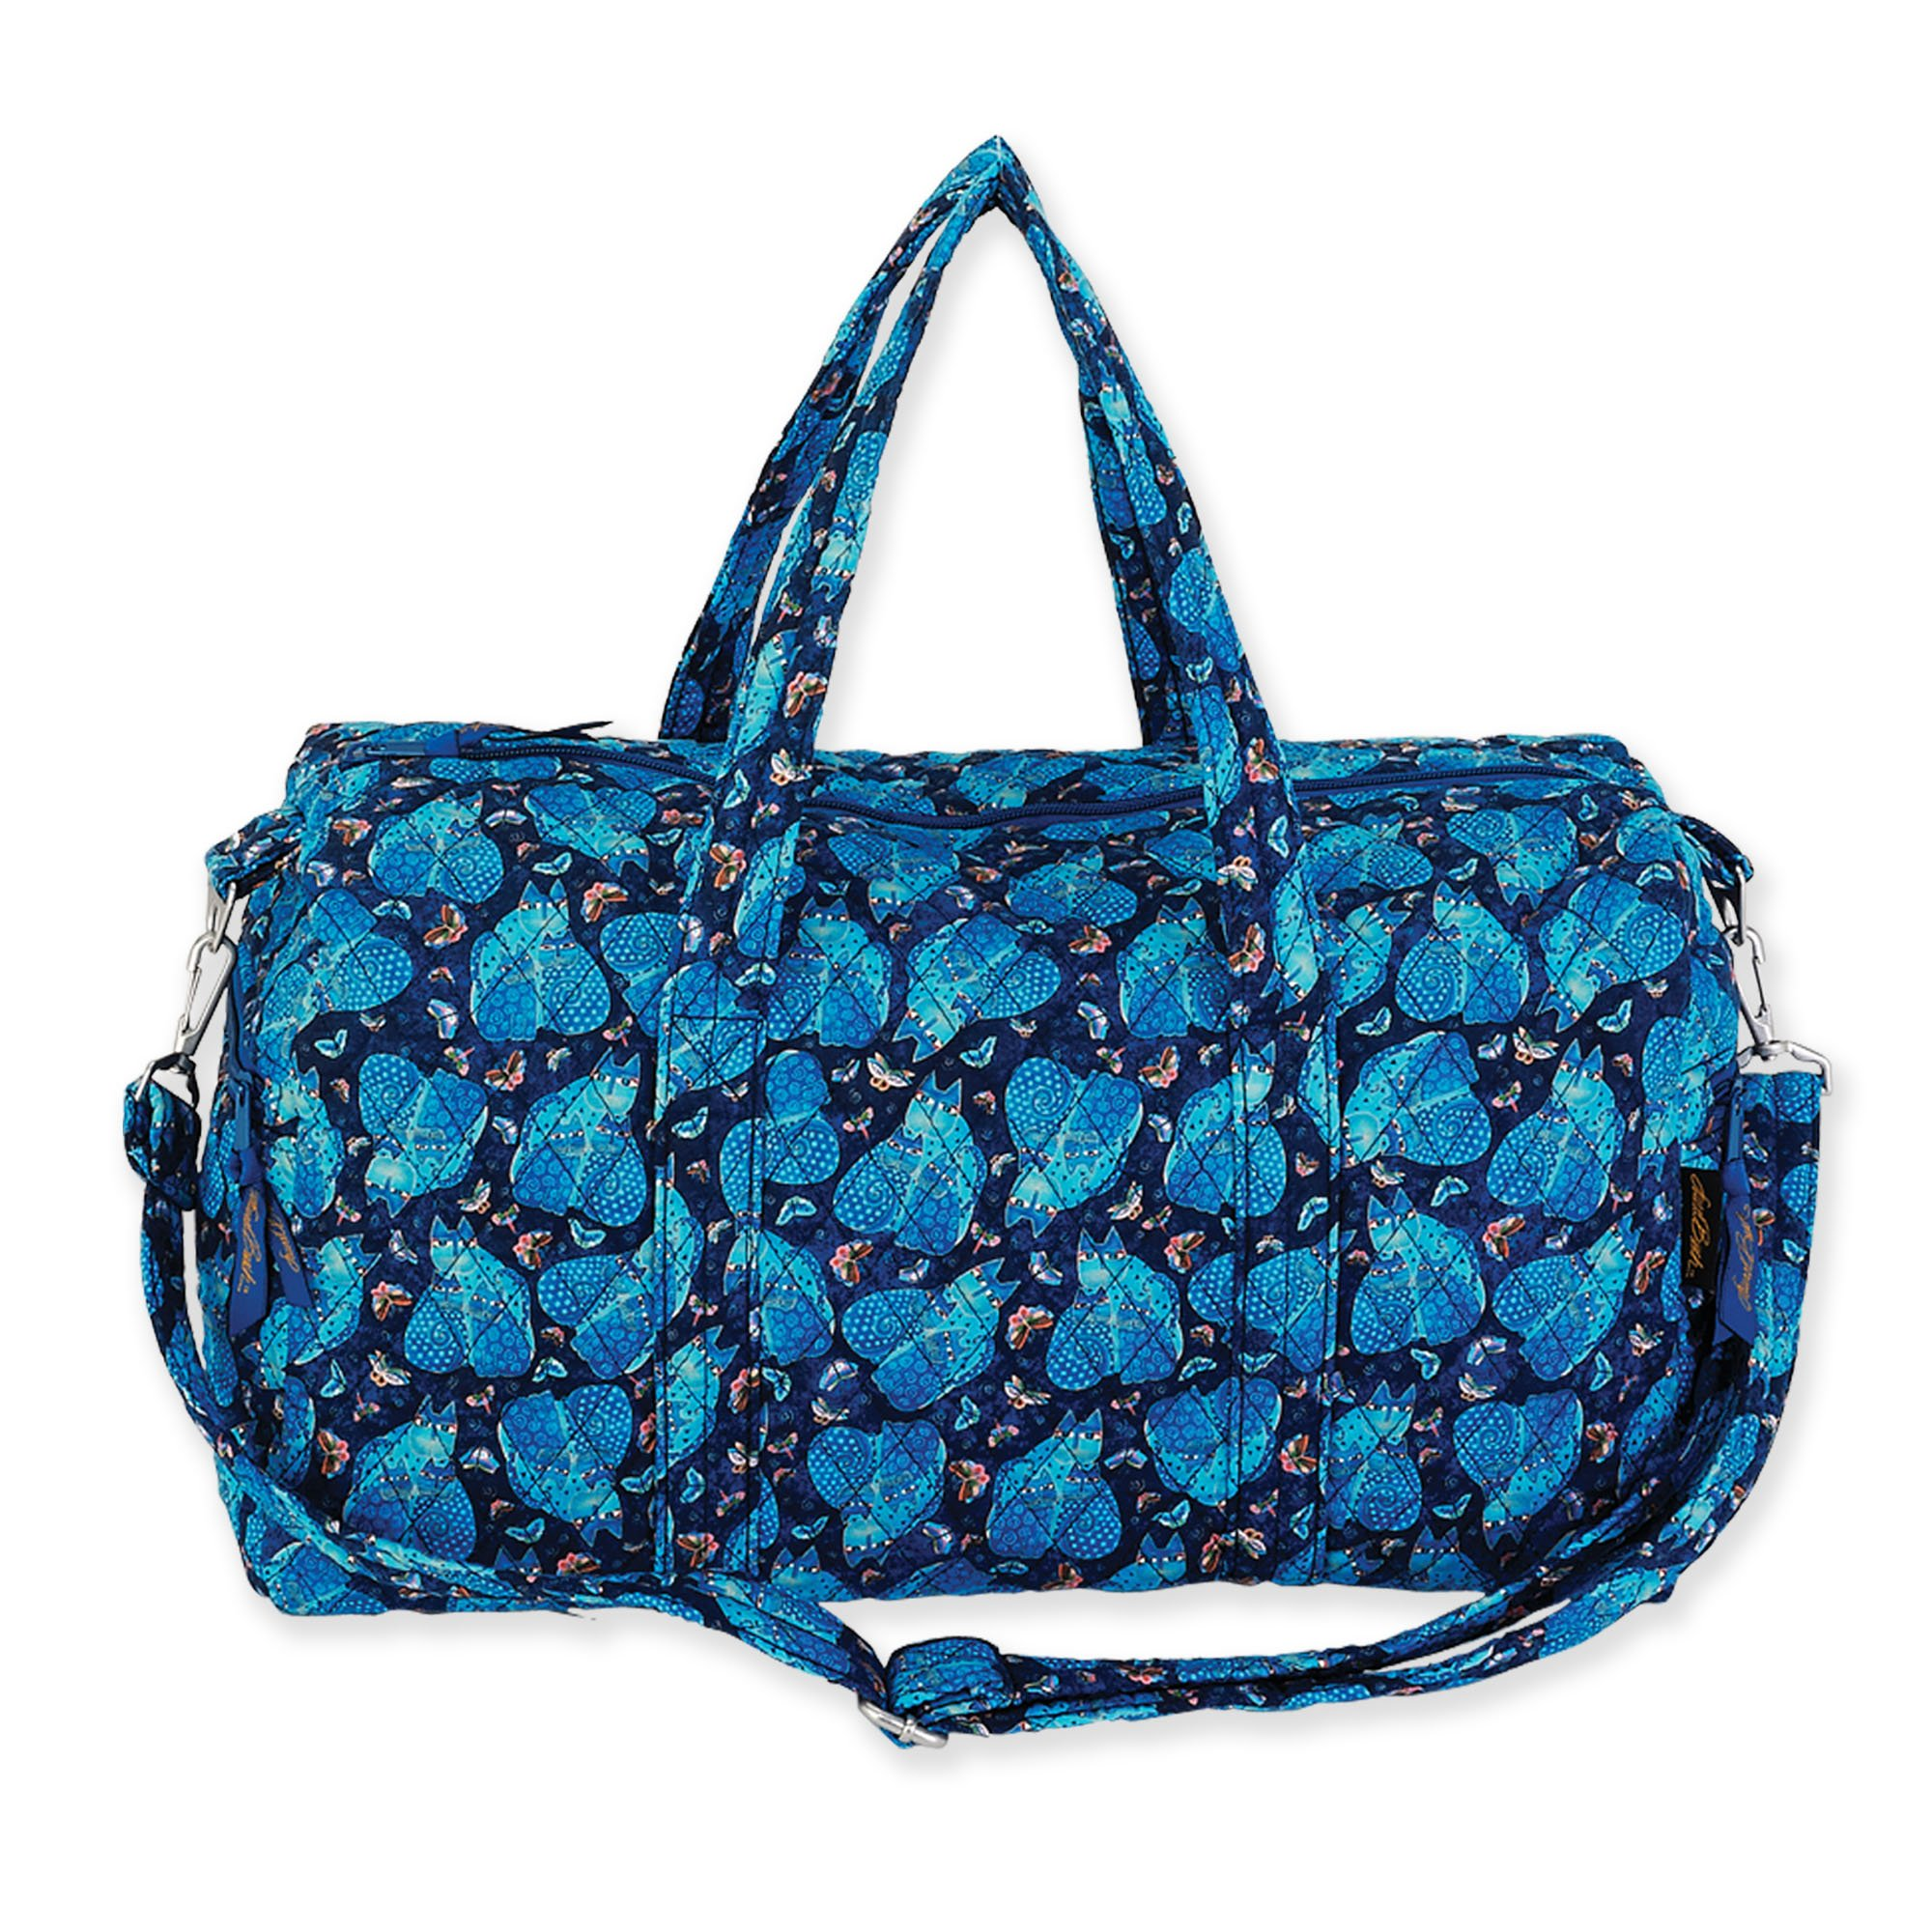 Laurel Burch Indigo Cats Weekender Travel Bag (Blue) by Laurel Burch (Image #1)